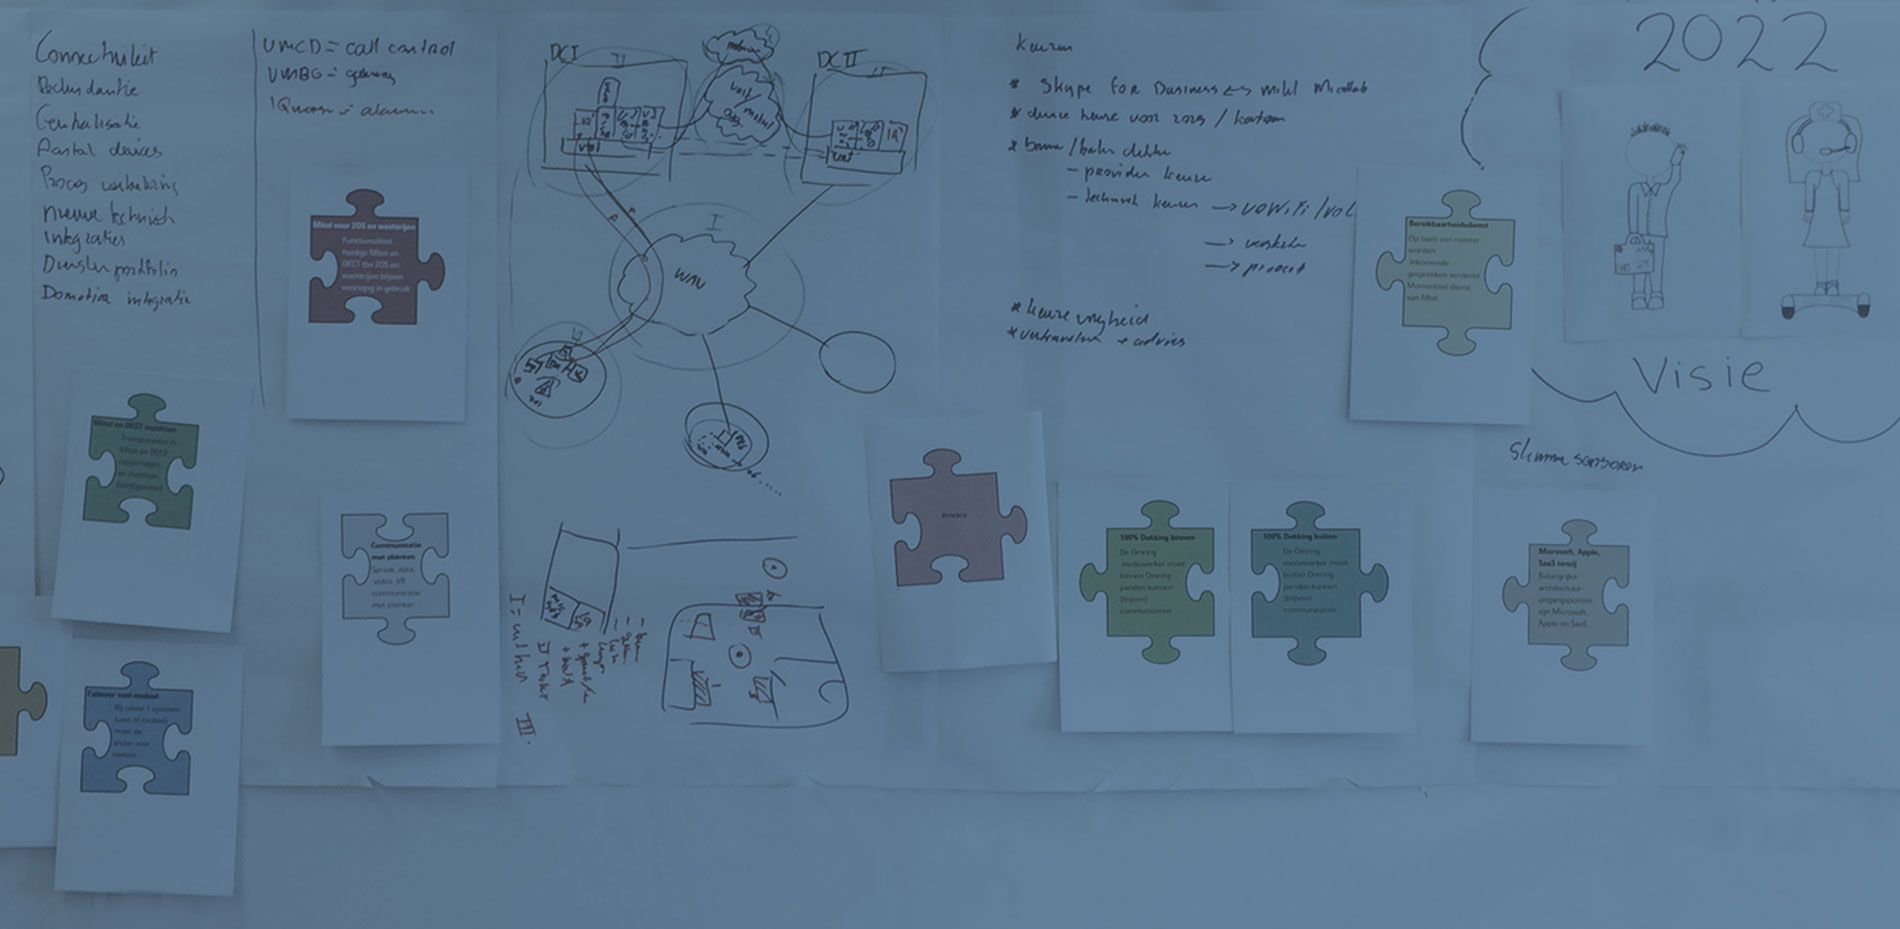 Effectieve leverancier & oplossing selectie